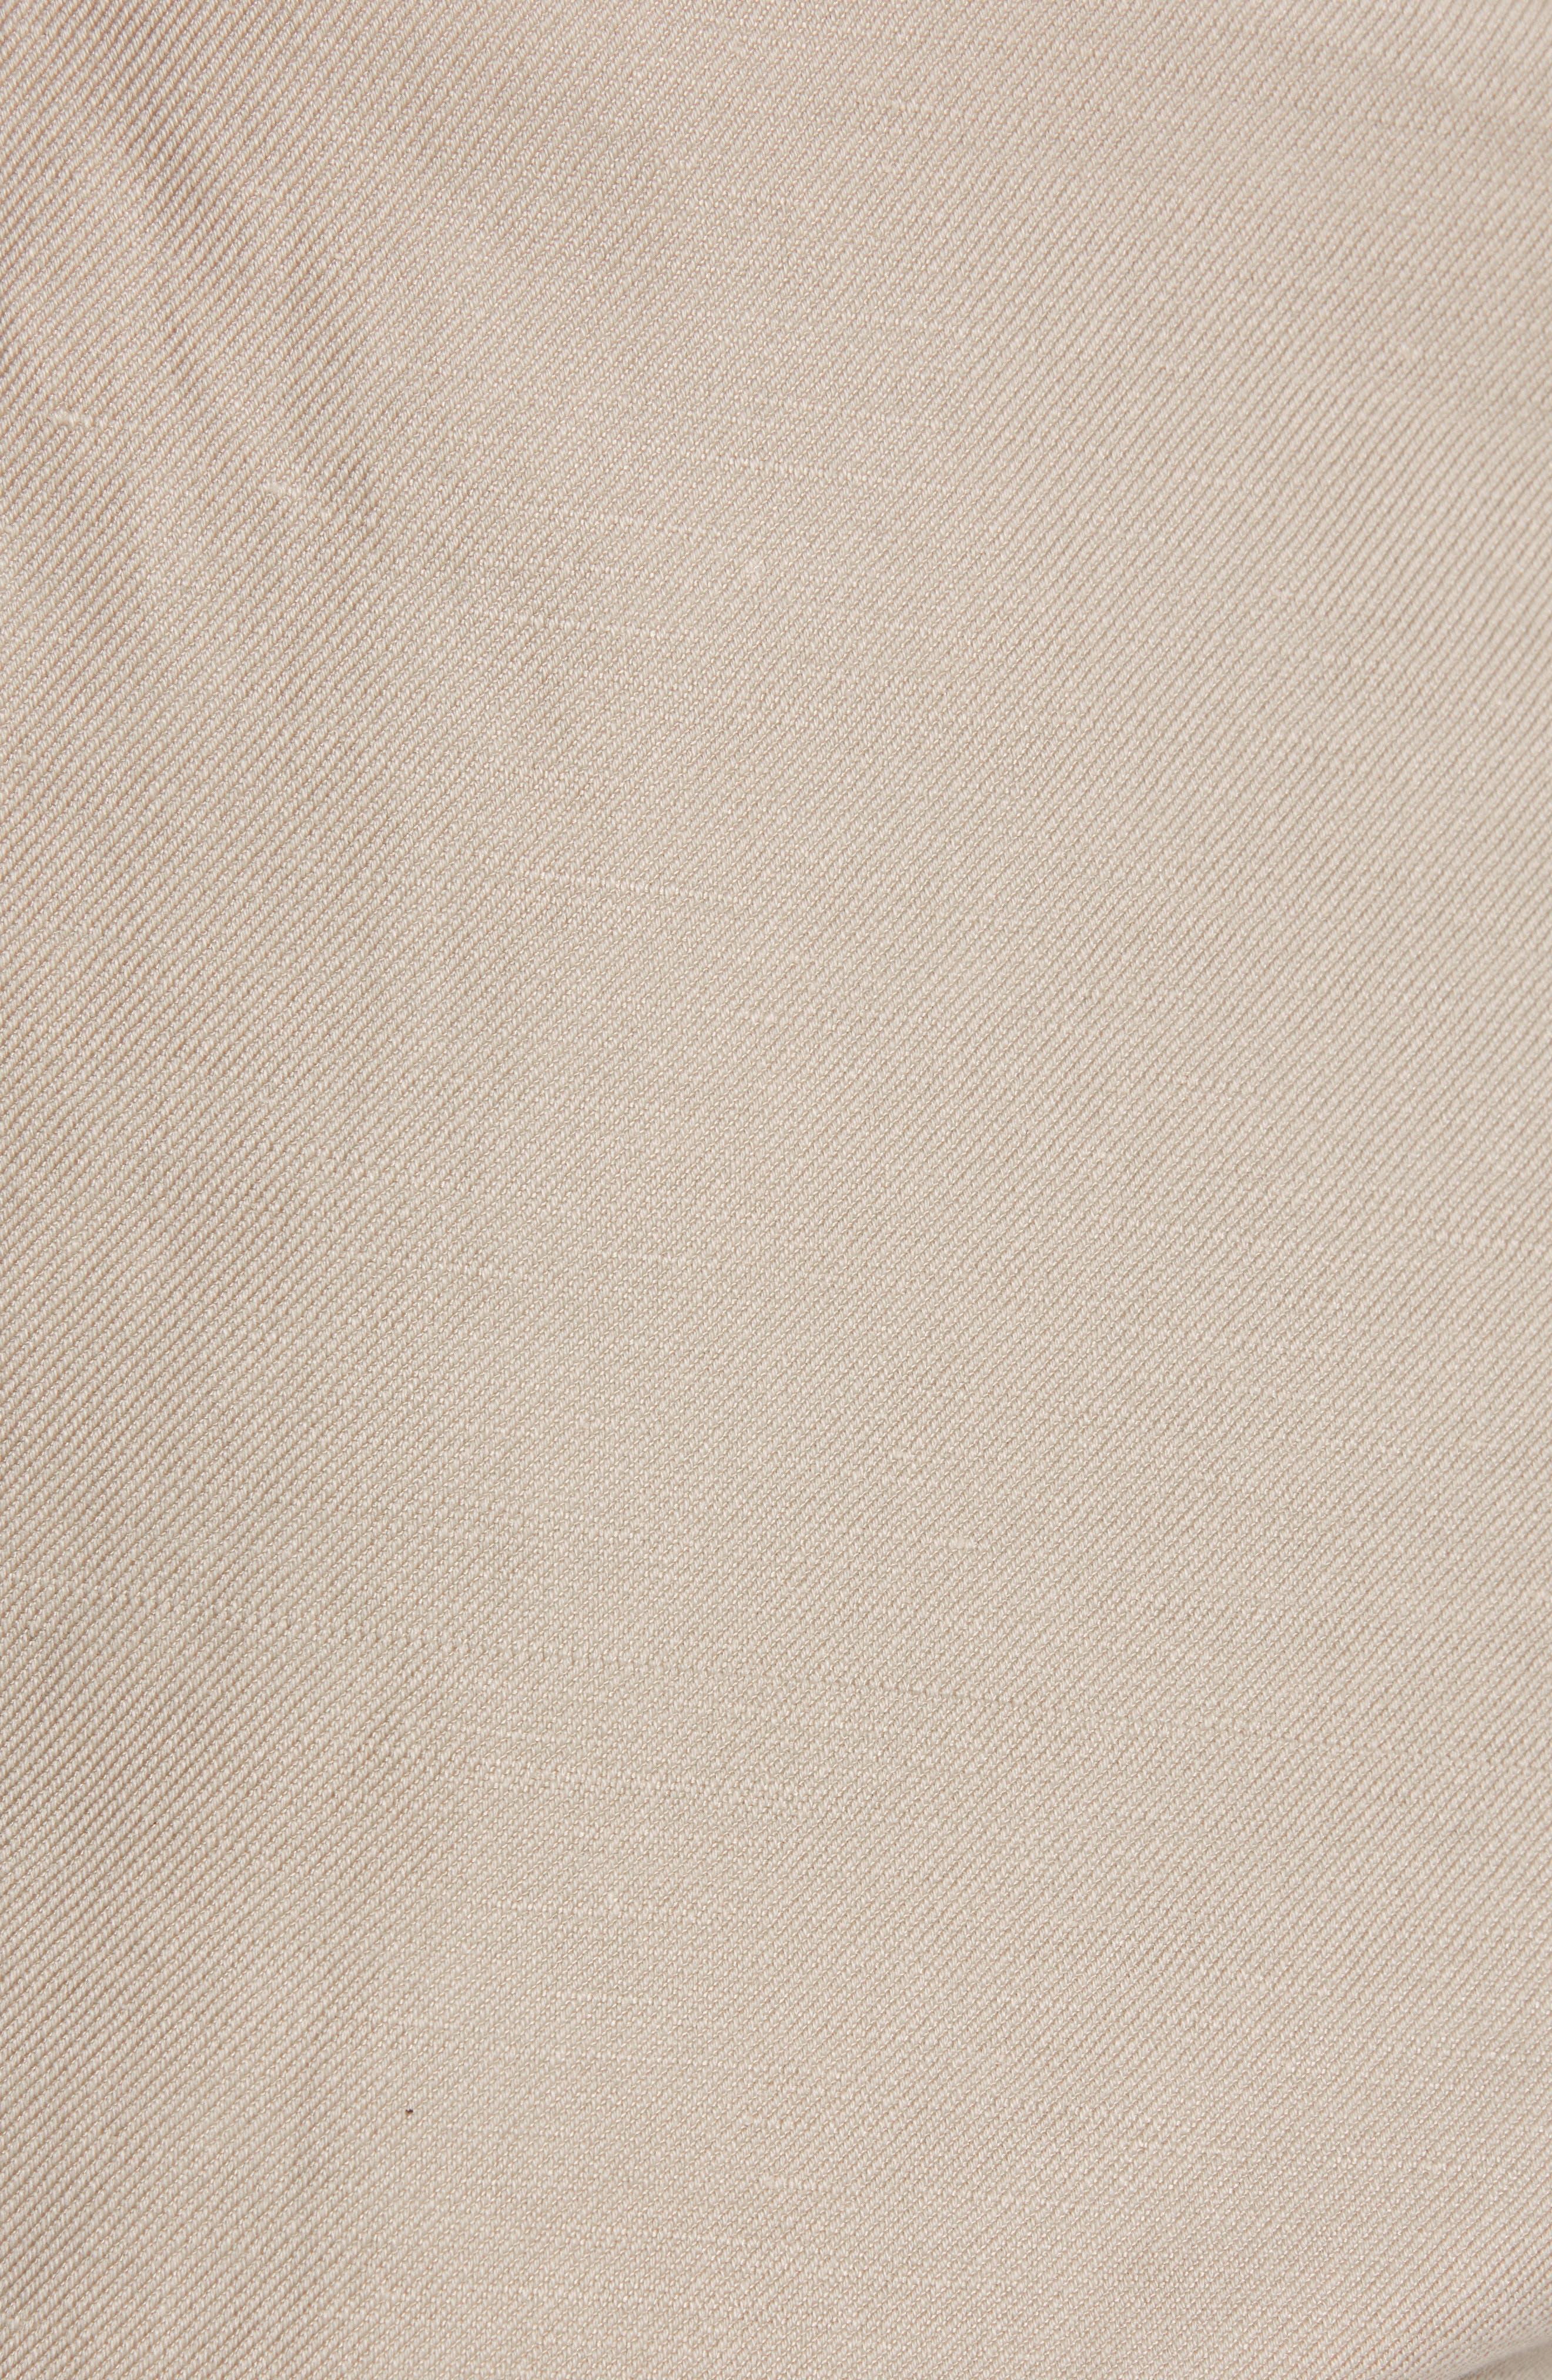 Sandyford Cargo Shorts,                             Alternate thumbnail 5, color,                             NATURAL